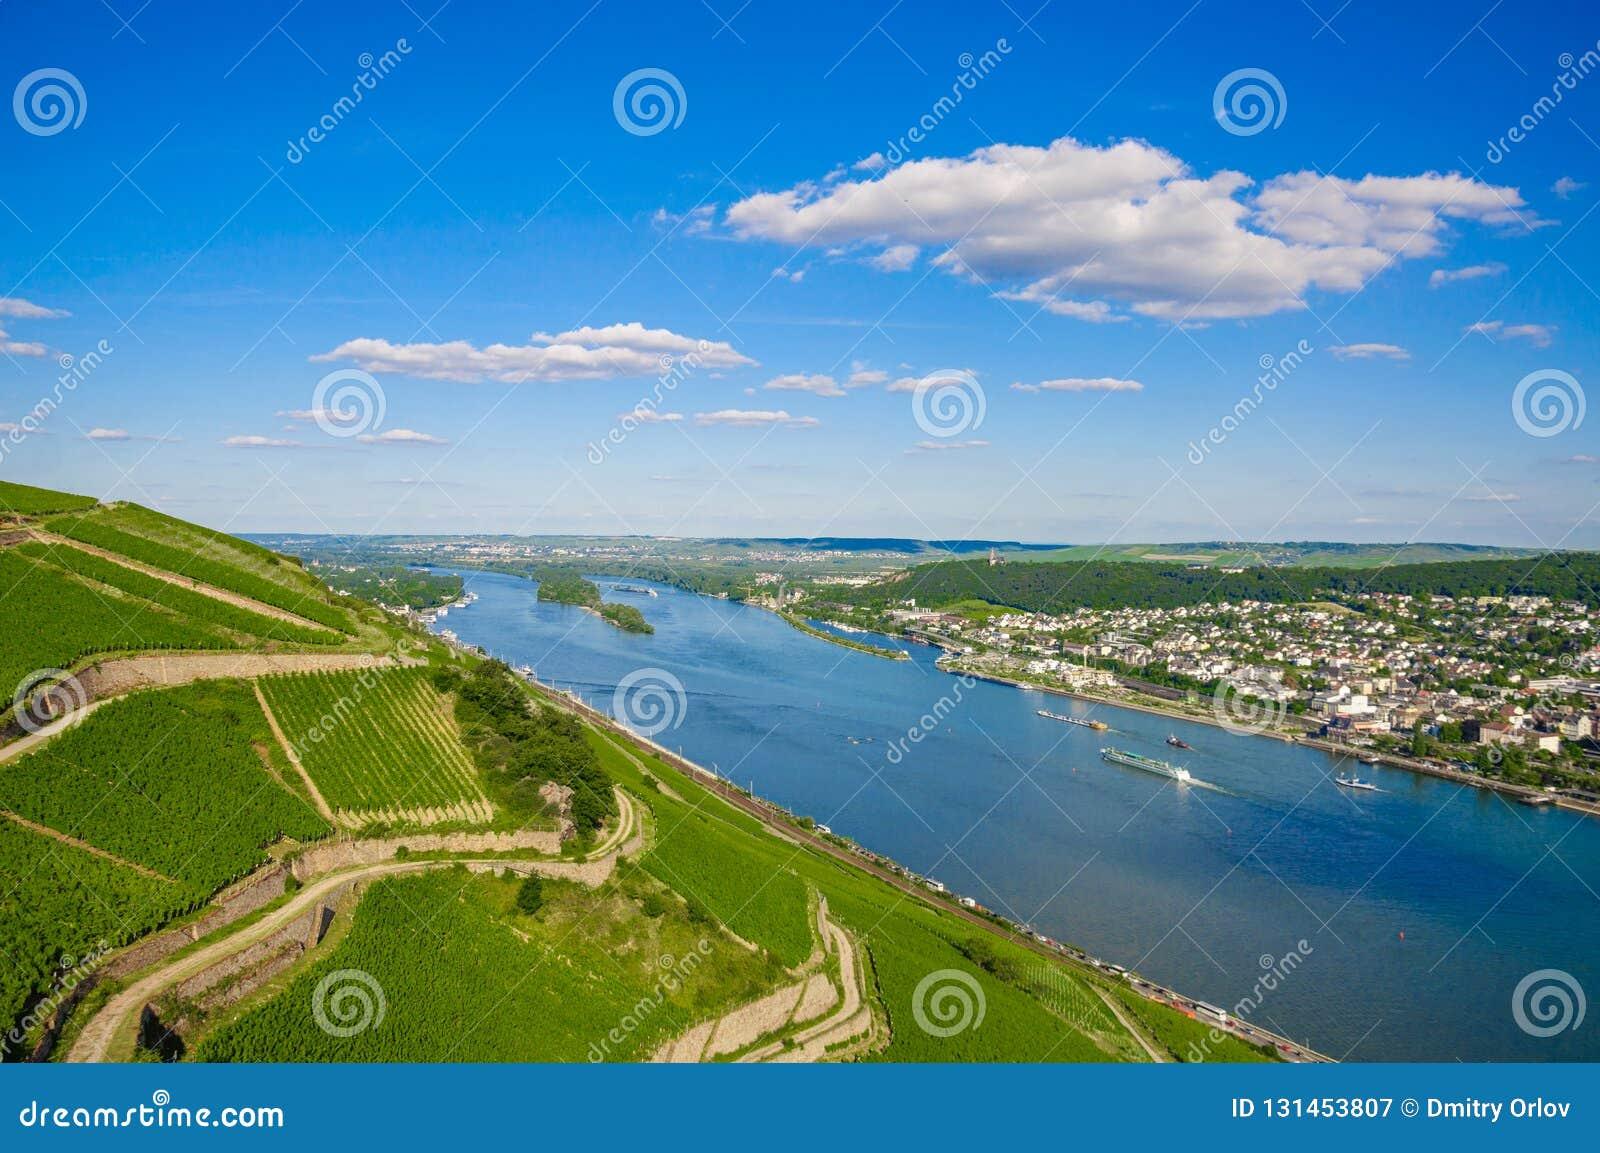 Le Rhin près de Bingen AM Rhein au Rhénanie-Palatinat, Allemagne